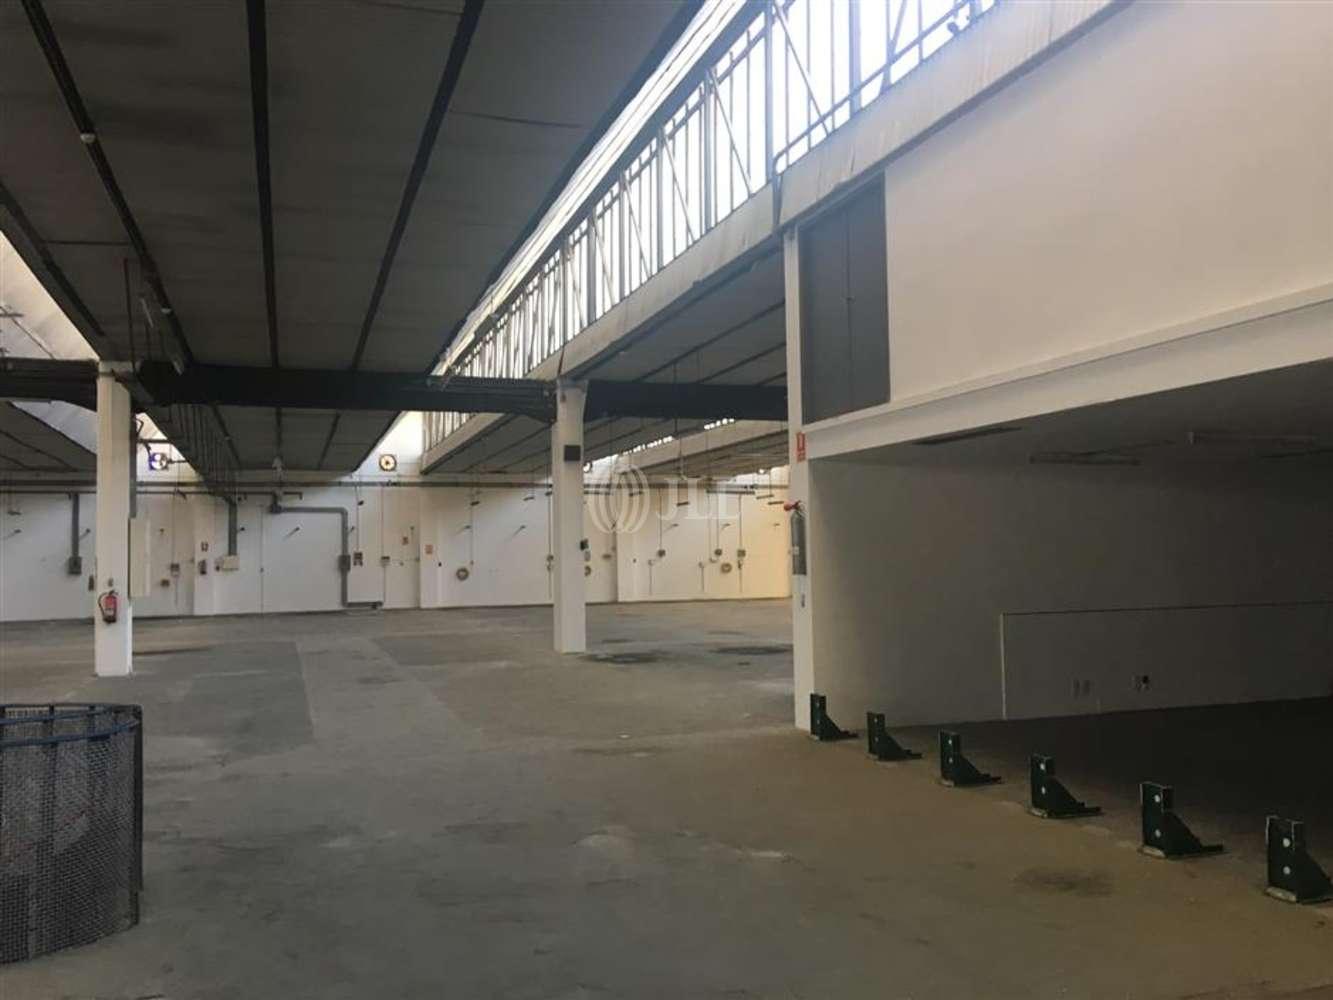 Naves industriales y logísticas Sant boi de llobregat, 08830 - Nave Industrial - B0412 - PI FONOLLAR NORD - 8265